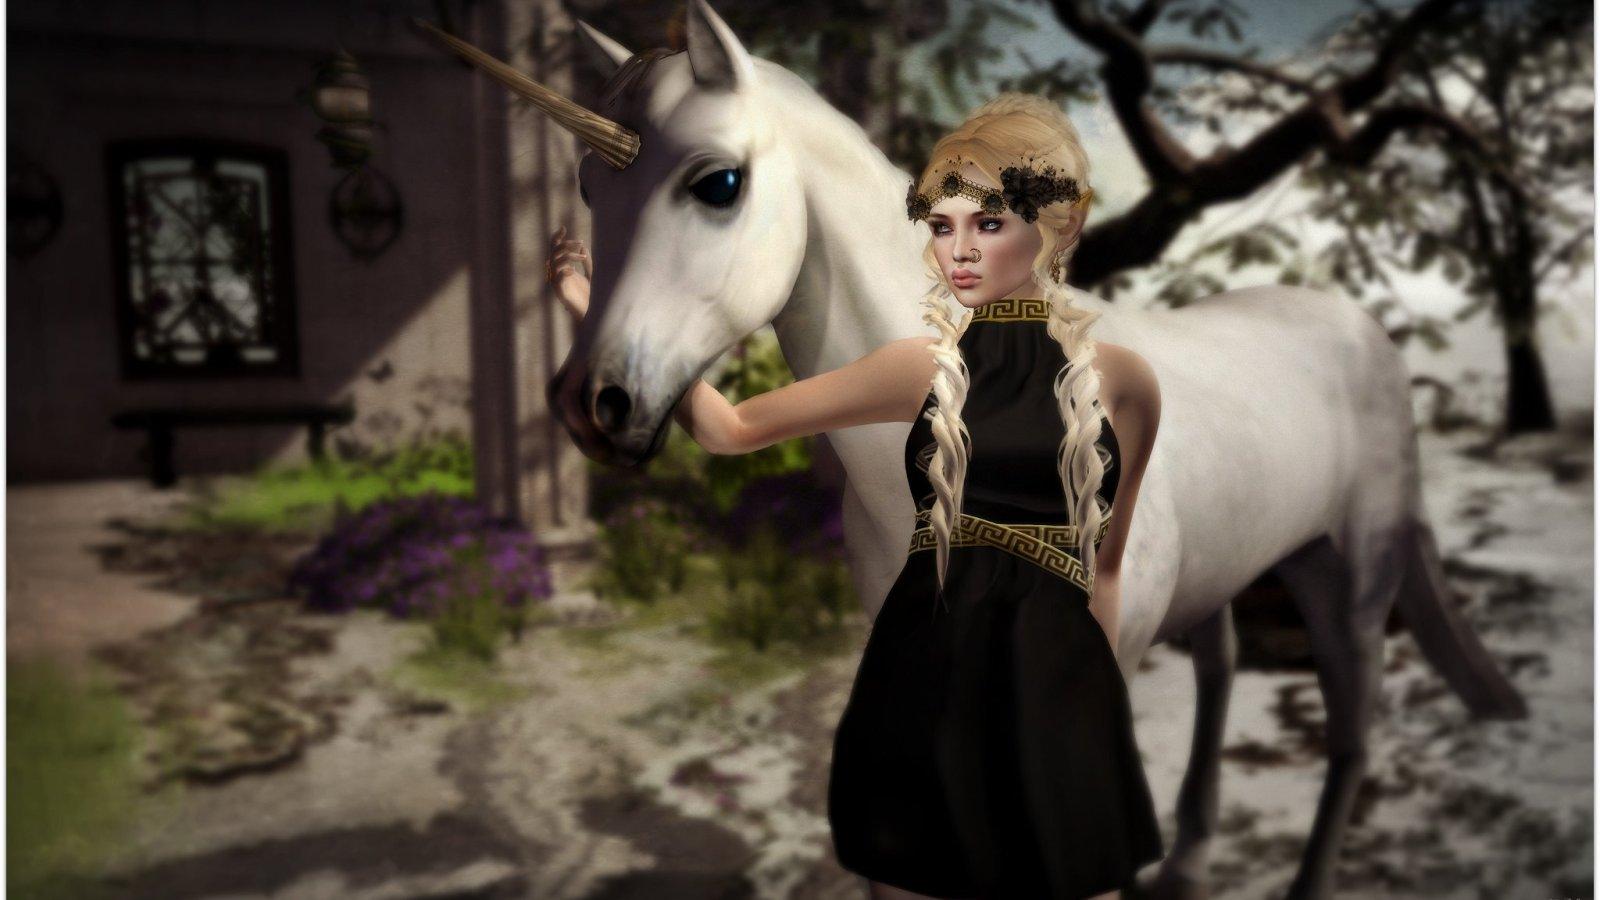 Ariadne and PaleMist